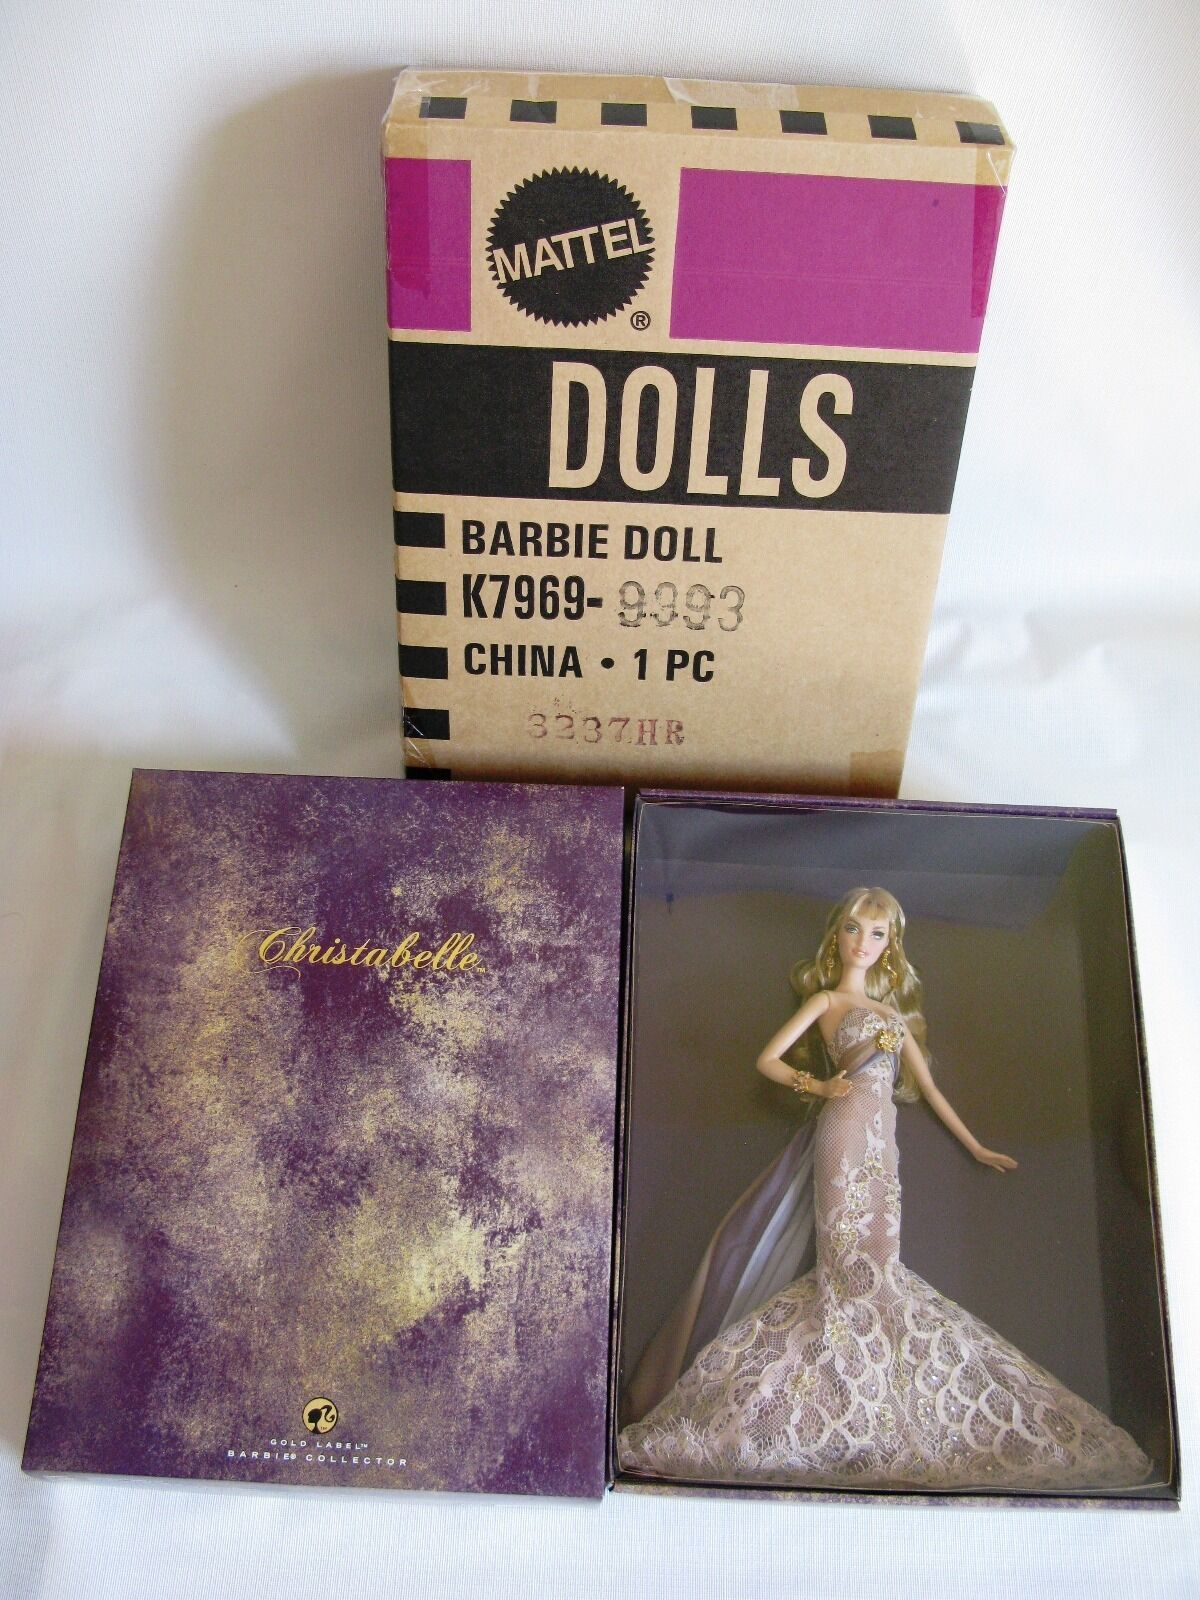 Muñeca Barbie Christabelle etiqueta dorada con caja de remitente 2007 Nuevo